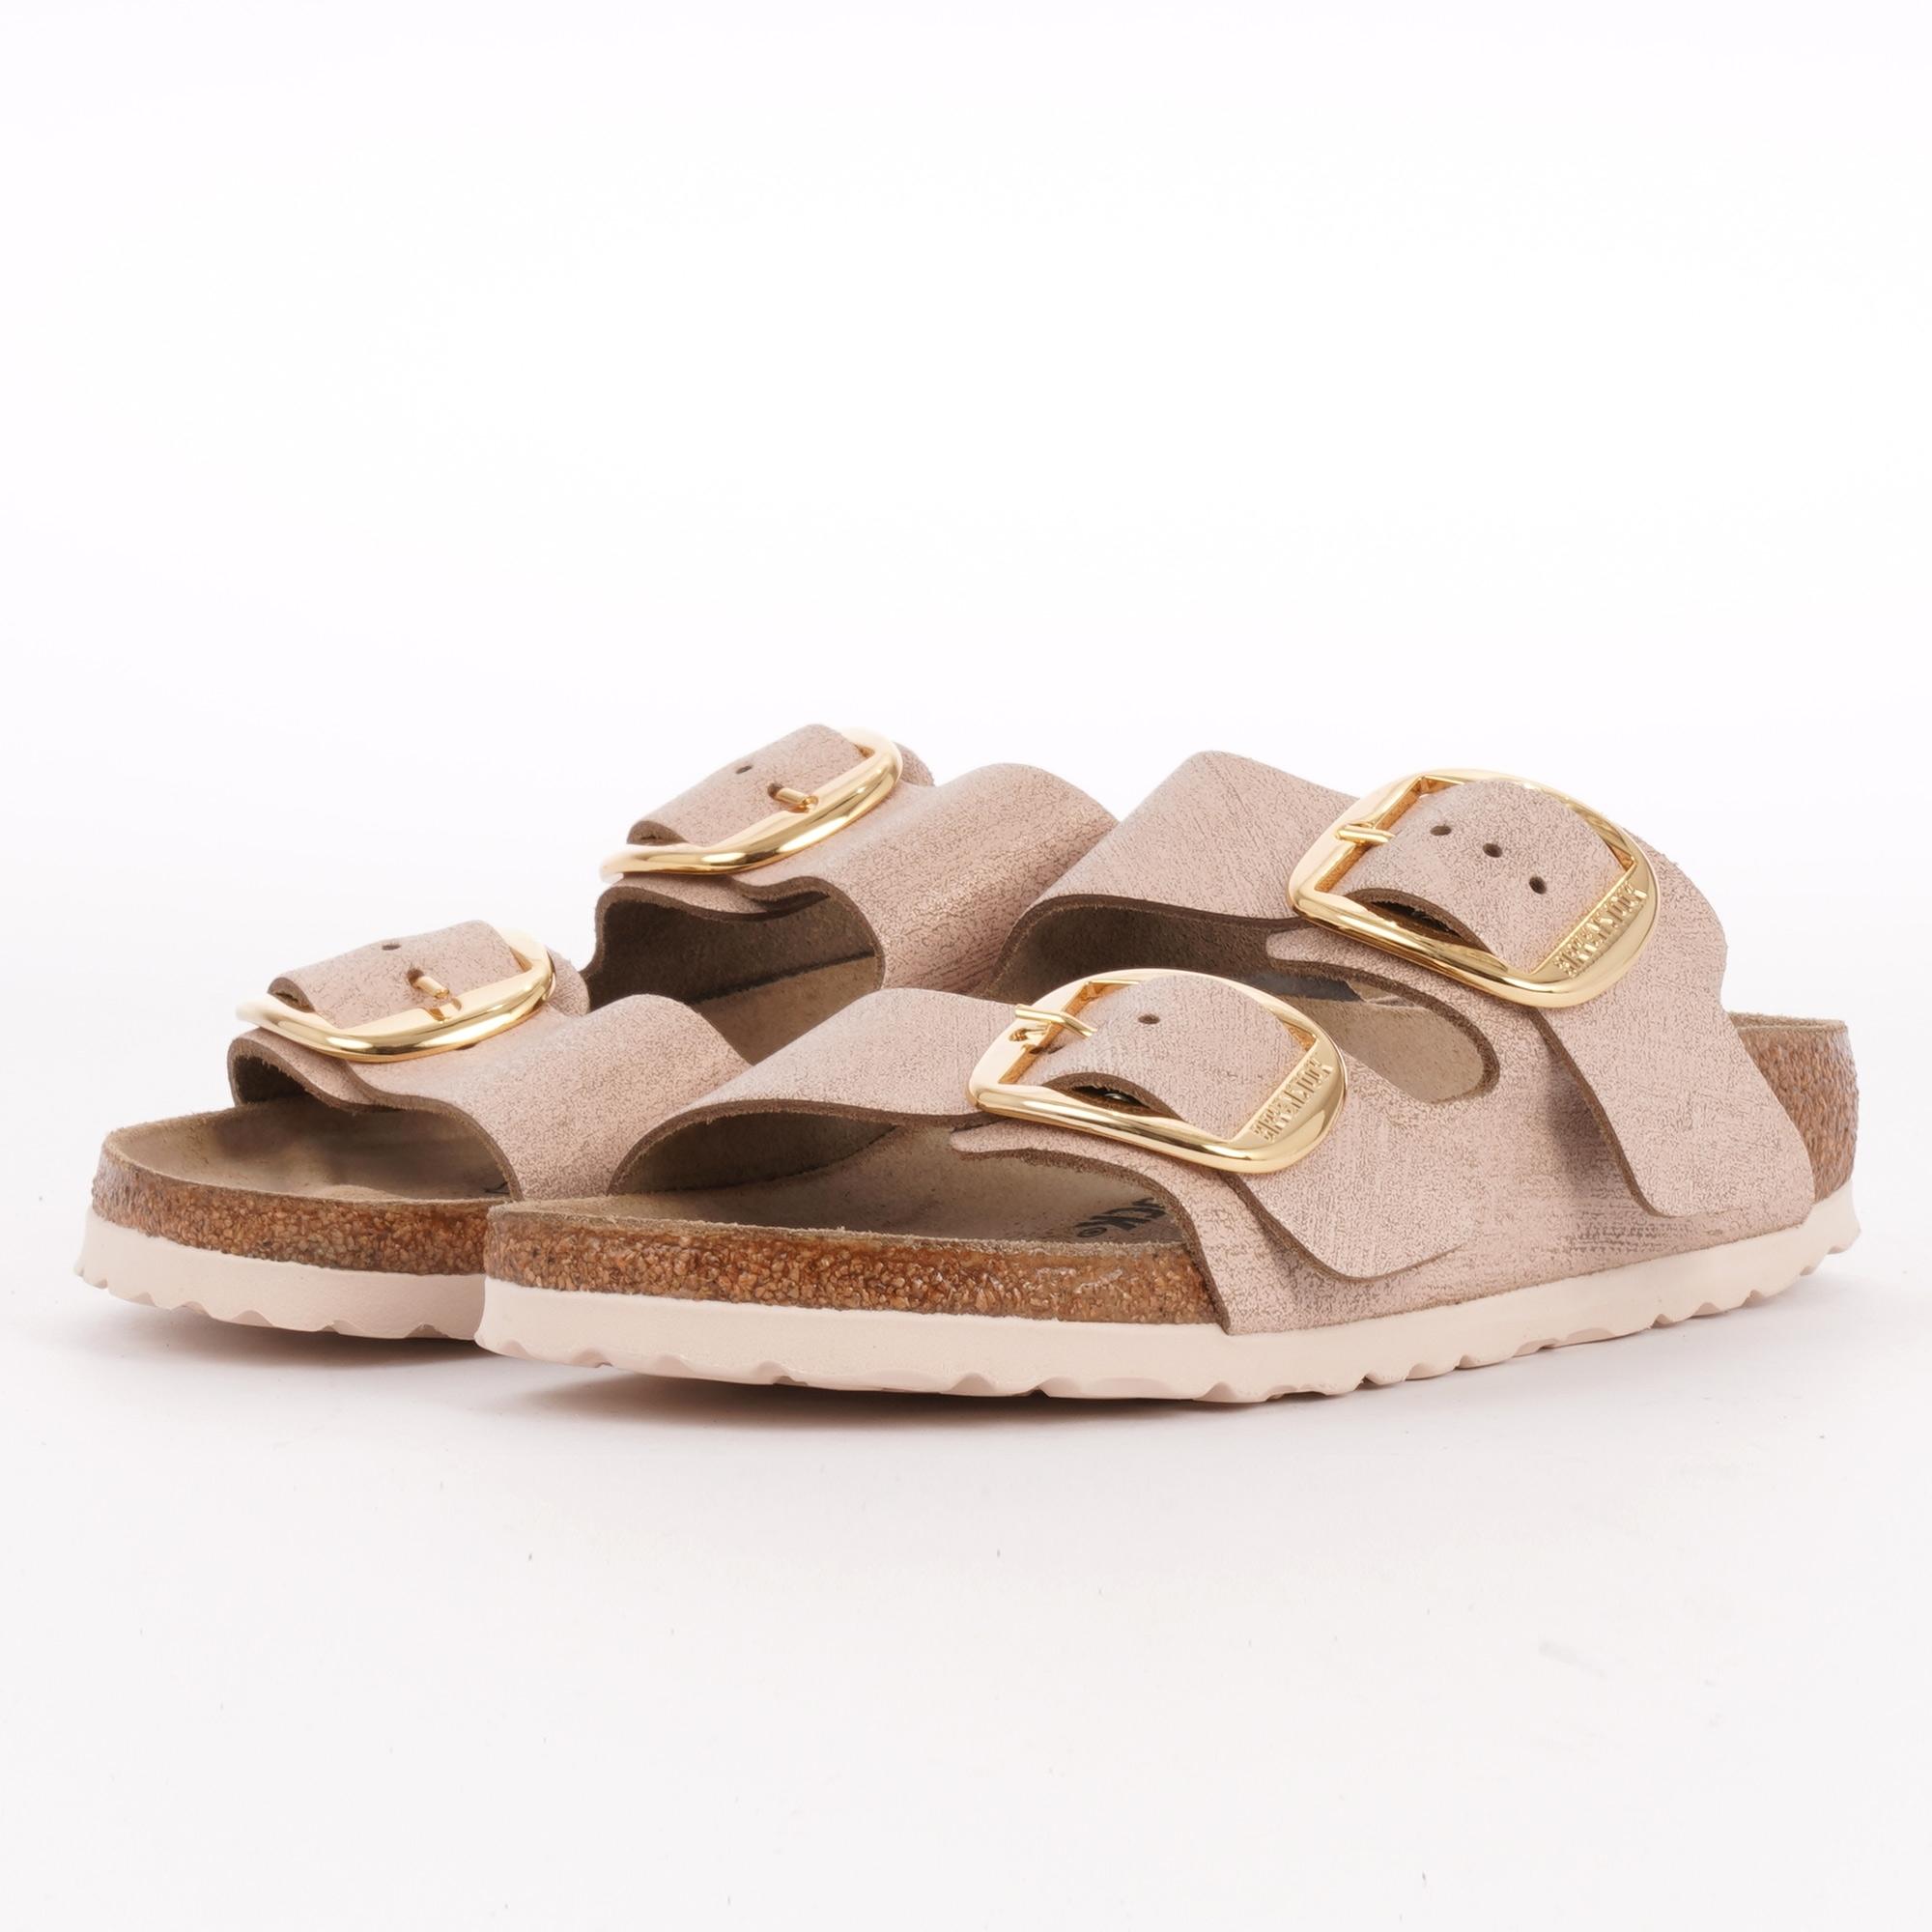 6a3da431a685 Arizona Big Buckle Sandals - Washed Metallic Rose Gold